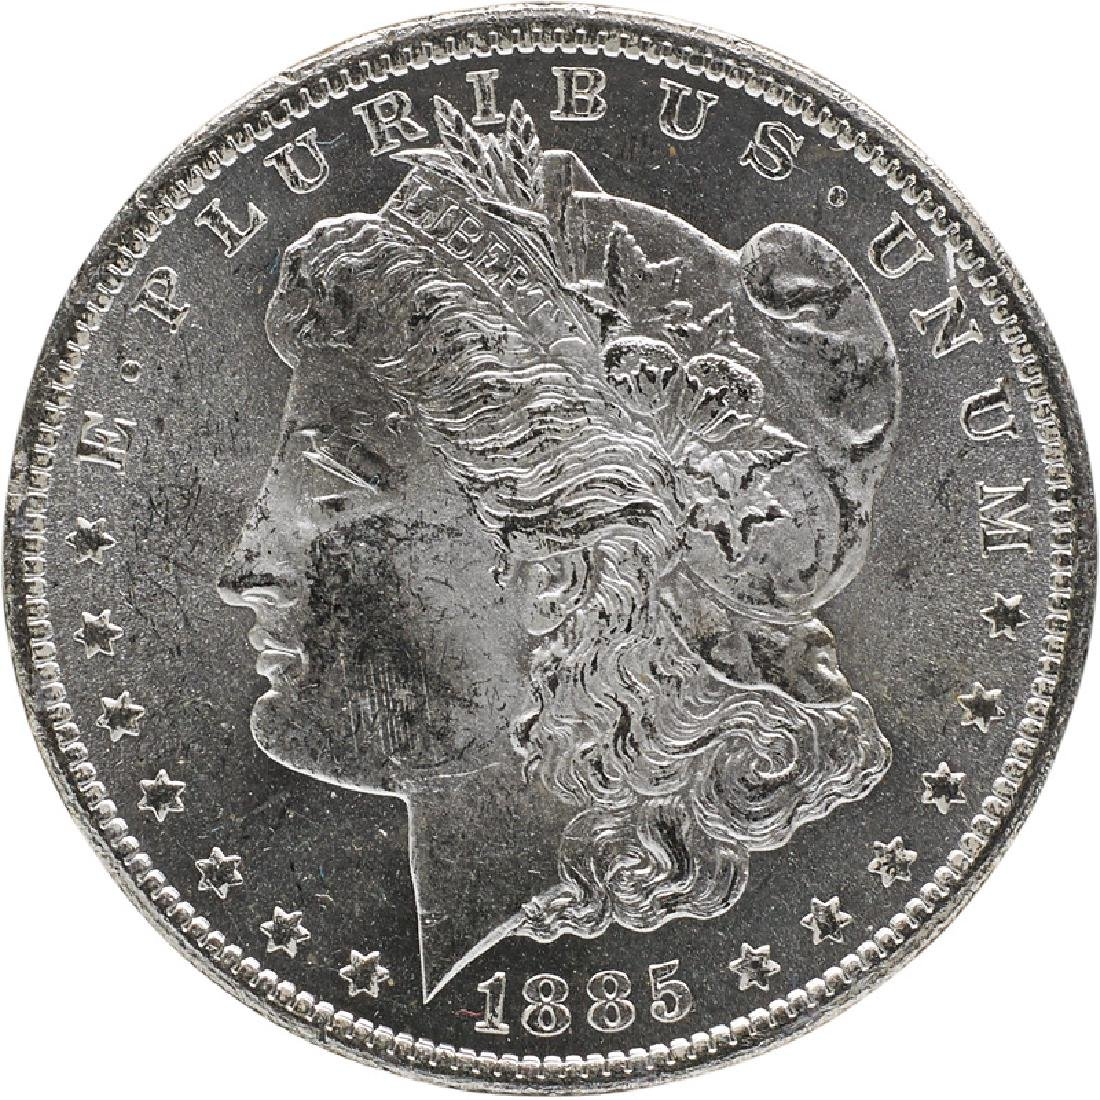 U.S. 1885-CC GSA MORGAN $1 COIN